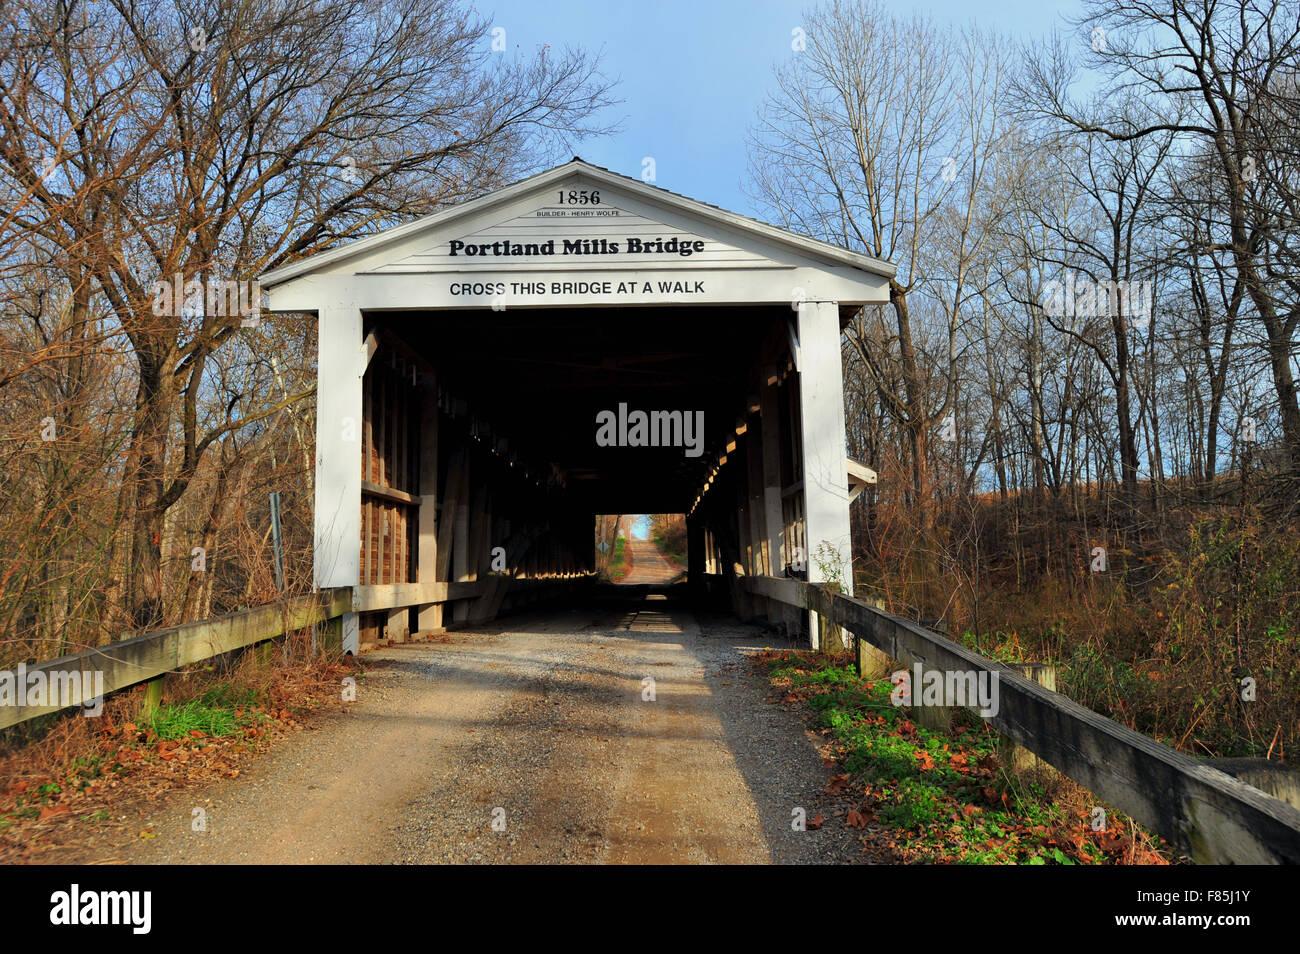 The Portland Mills Bridge in Parke County, Indiana over Little Raccoon Creek near Waveland, Indiana, USA. - Stock Image